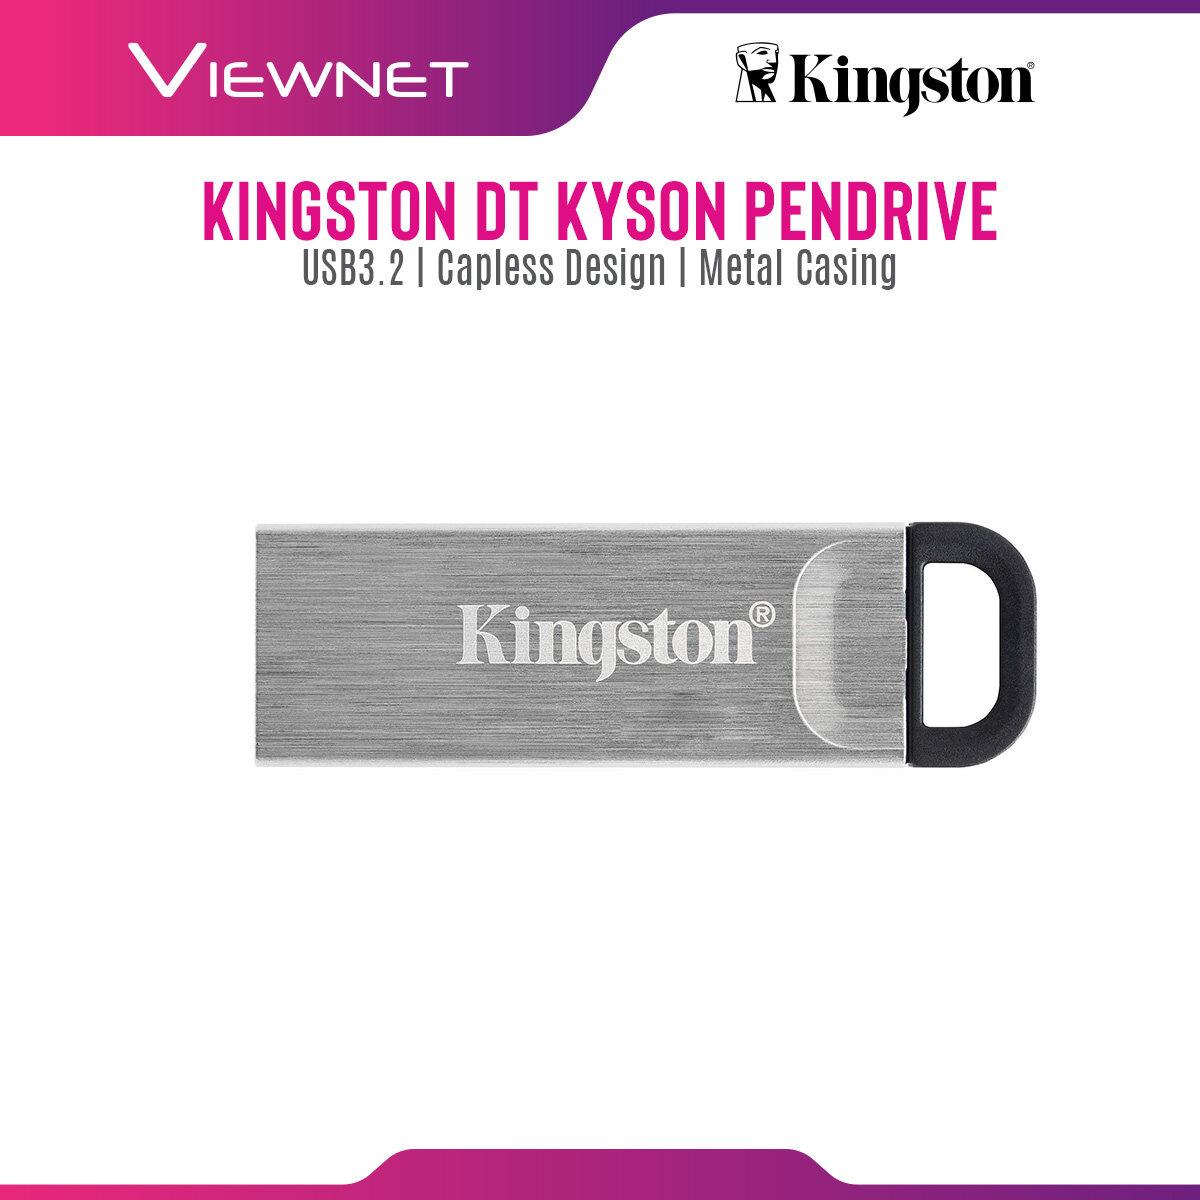 Kingston DataTraveler Kyson USB Pendrive (32GB / 64GB / 128GB / 256GB) with USB 3.2 Connection, Capless Design, Metal Casing, Strap Hole